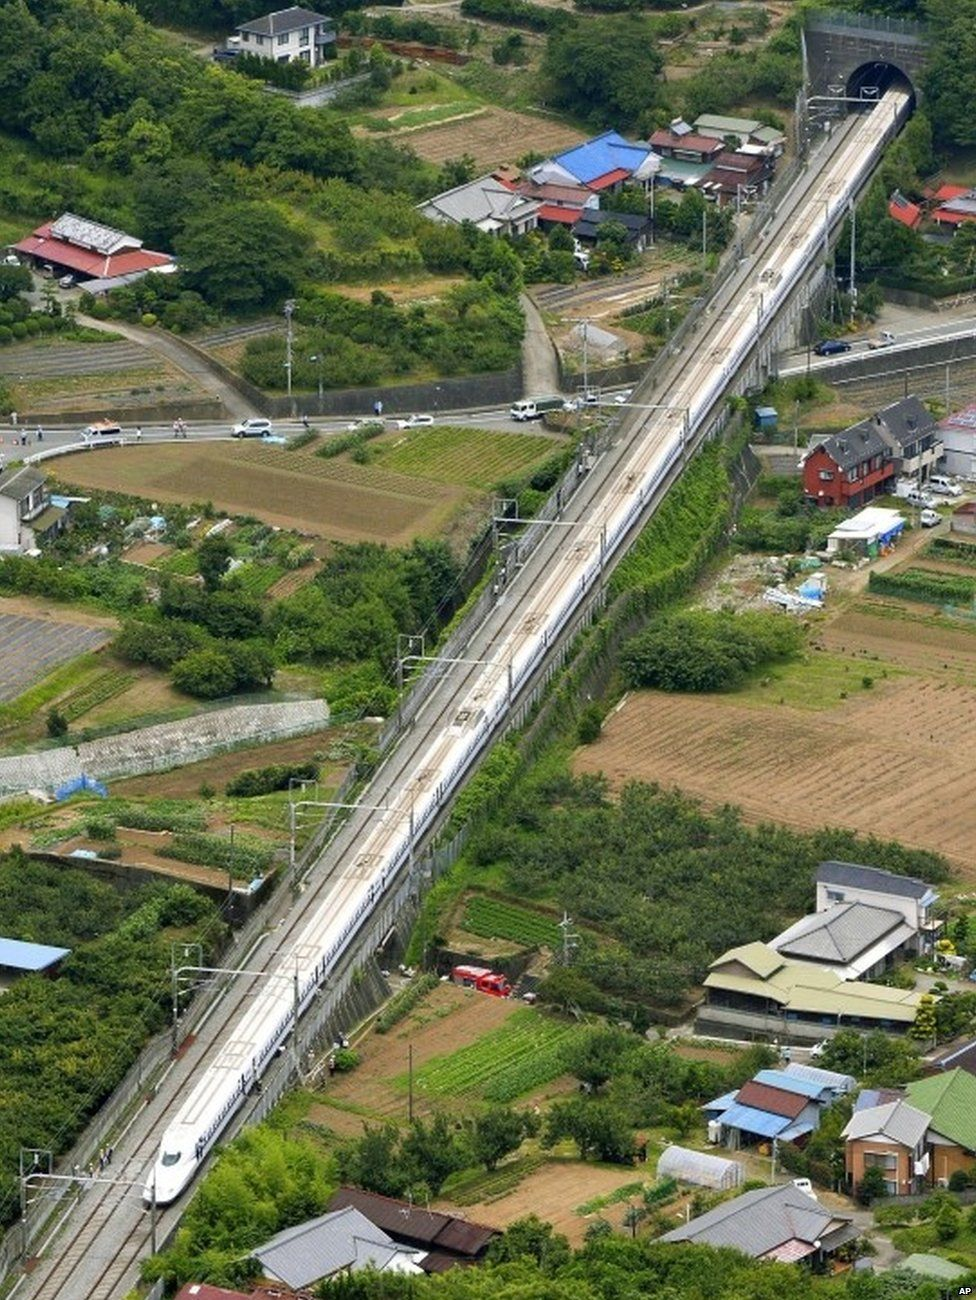 A Shinkansen bullet train stops in Odawara, west of Tokyo Tuesday, June 30, 2015.